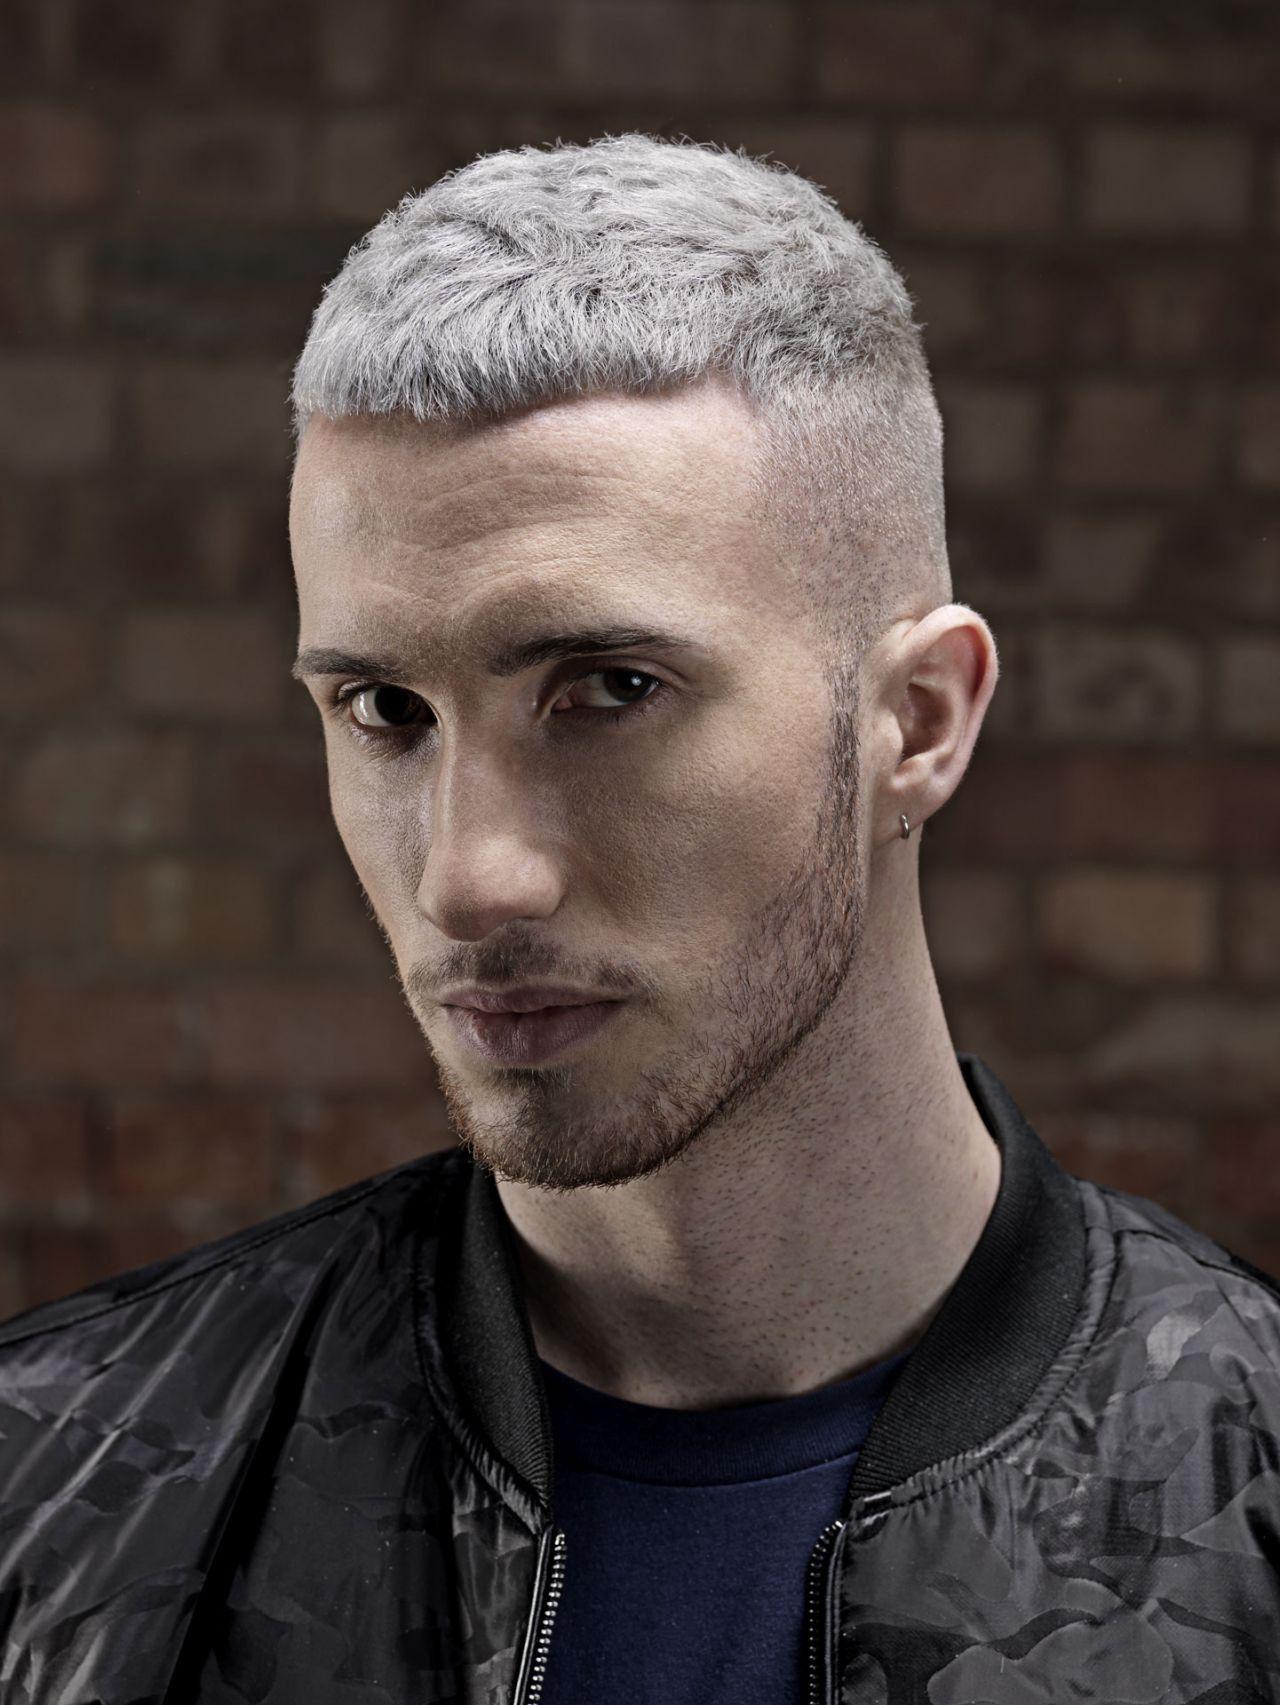 Männer Haare Inspirational Graue Haare Männer